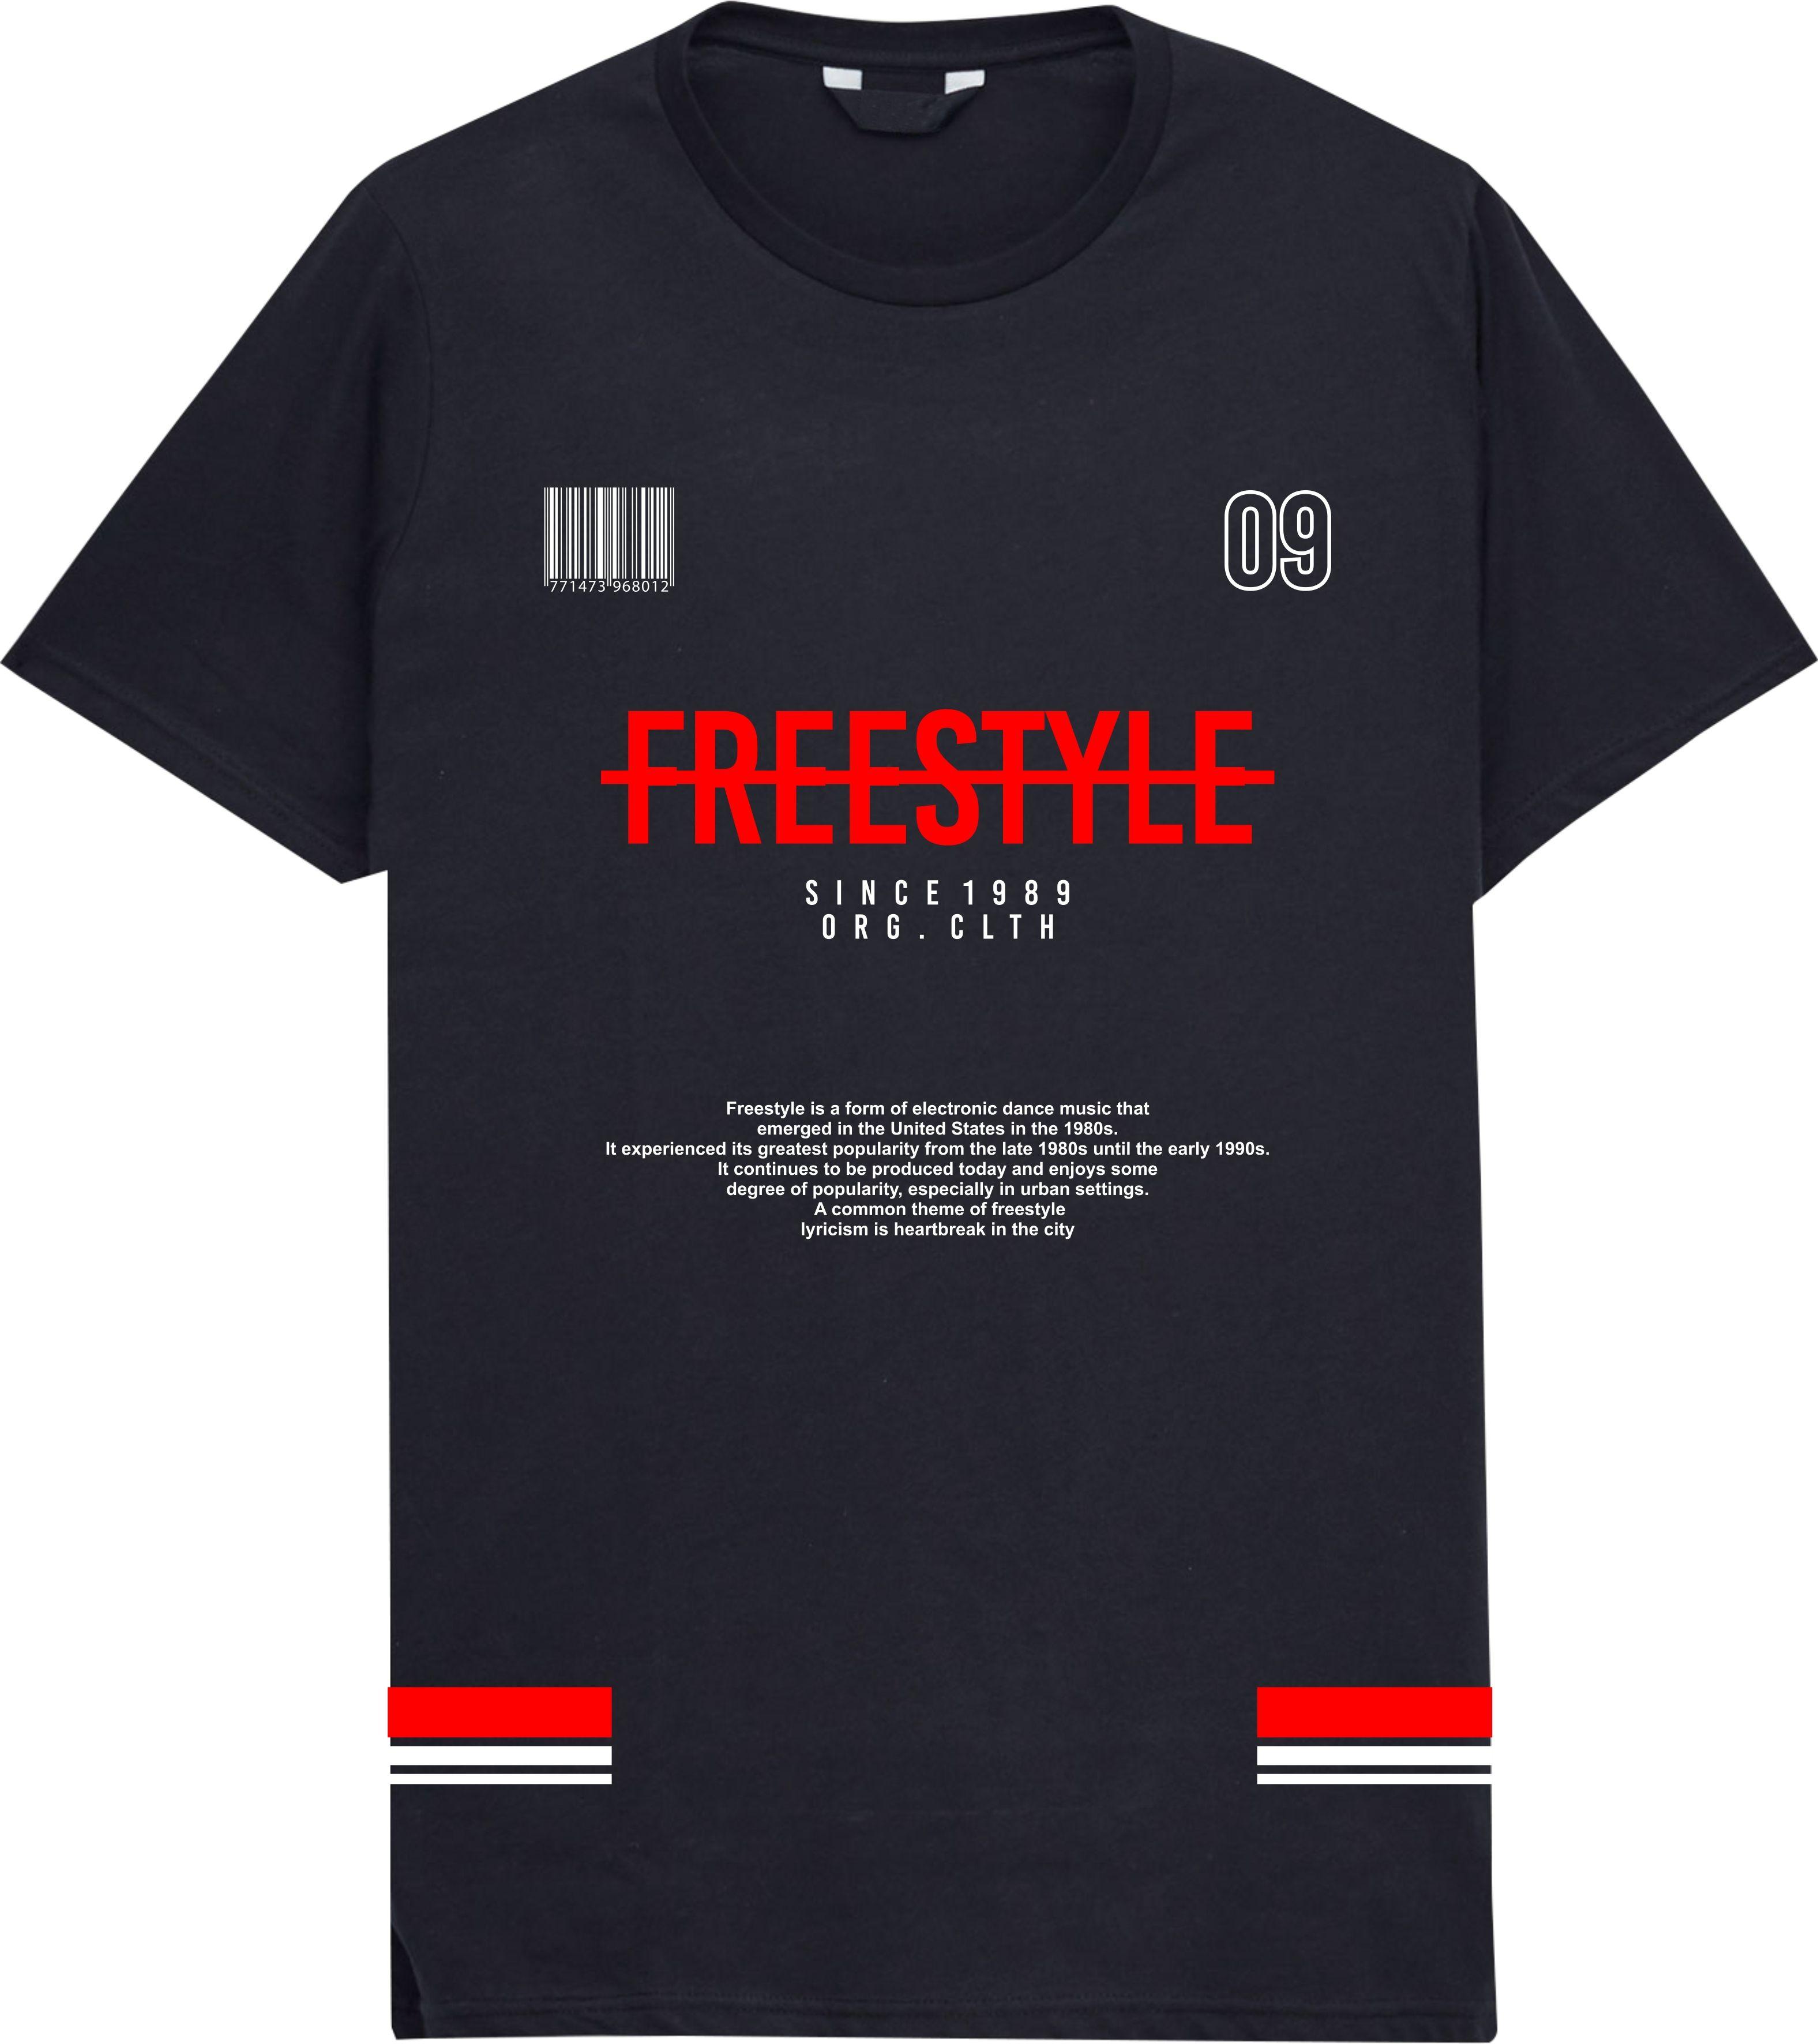 T shirt #volcom #adidas #billabong #ripcurl #nike